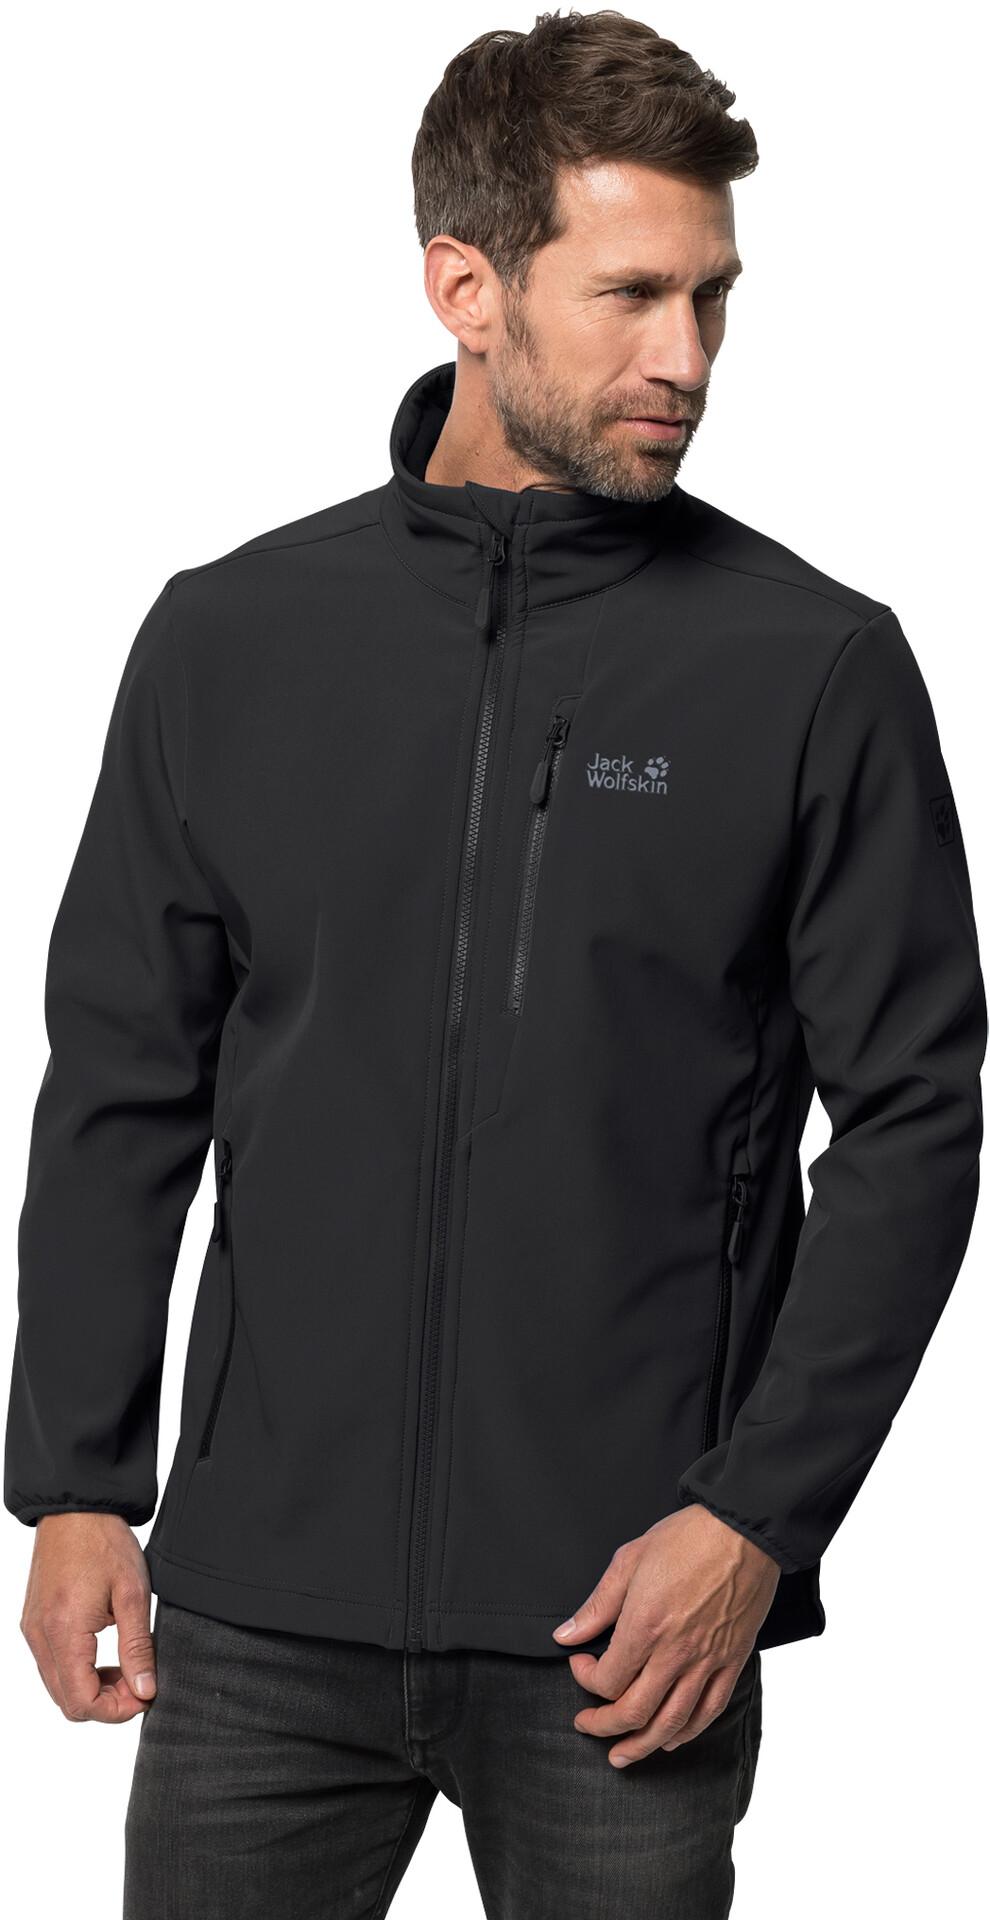 Jack Wolfskin Whirlwind Softshell Jacket Men, black